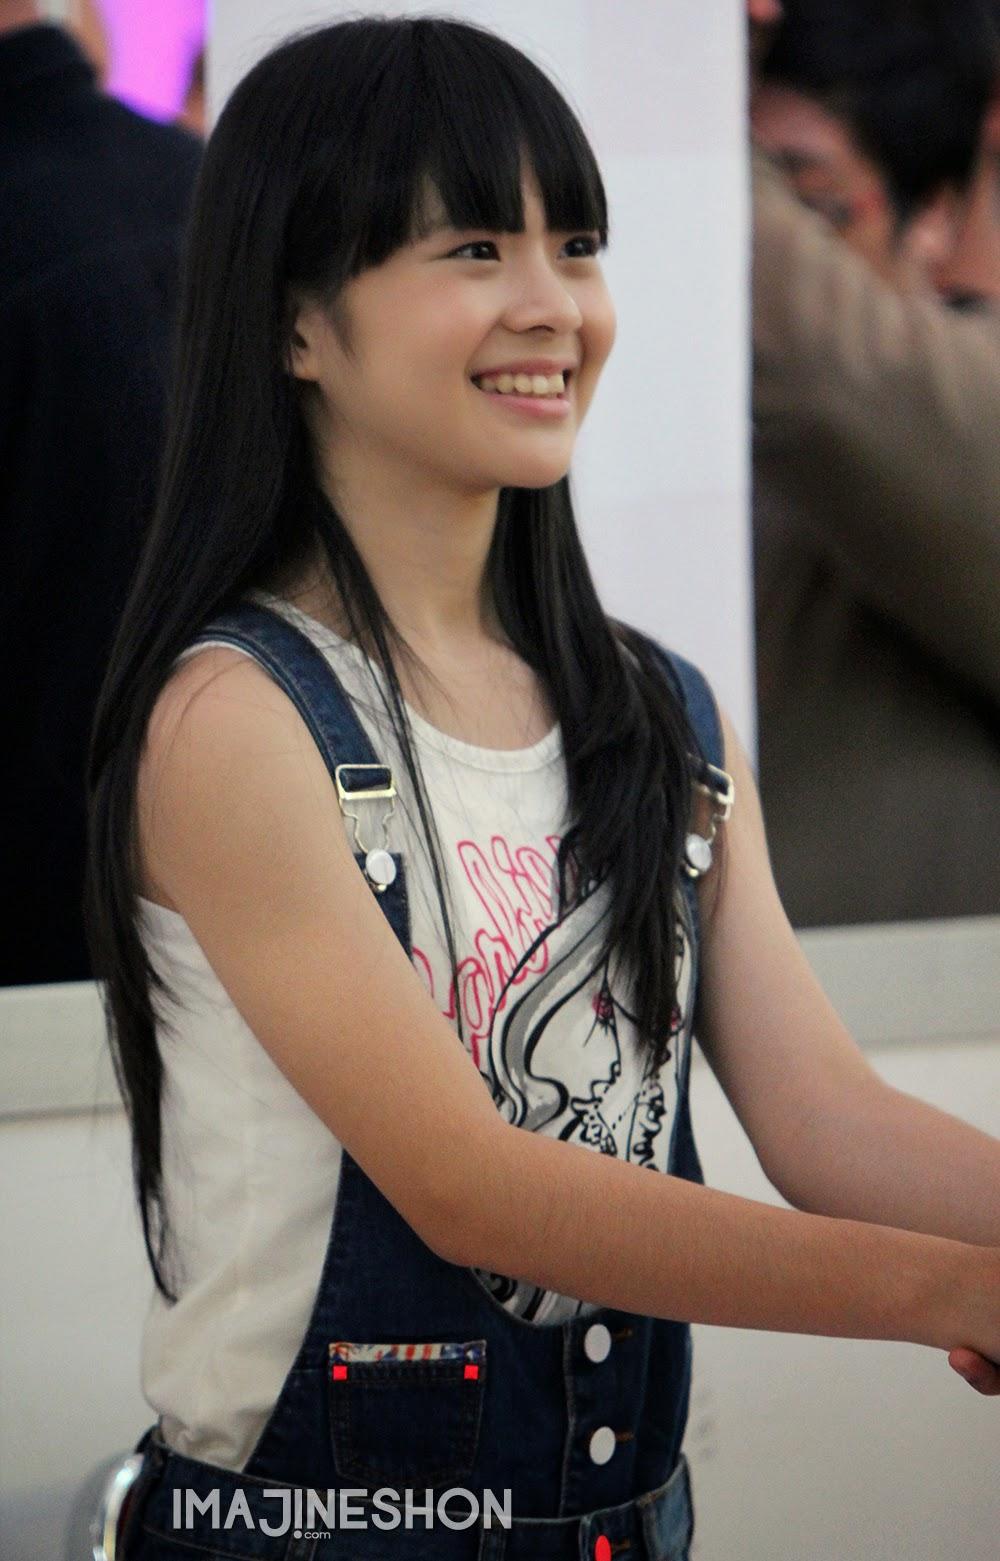 Foto JKT48 Handshake Event Terbaru | Foto Personil JKT48